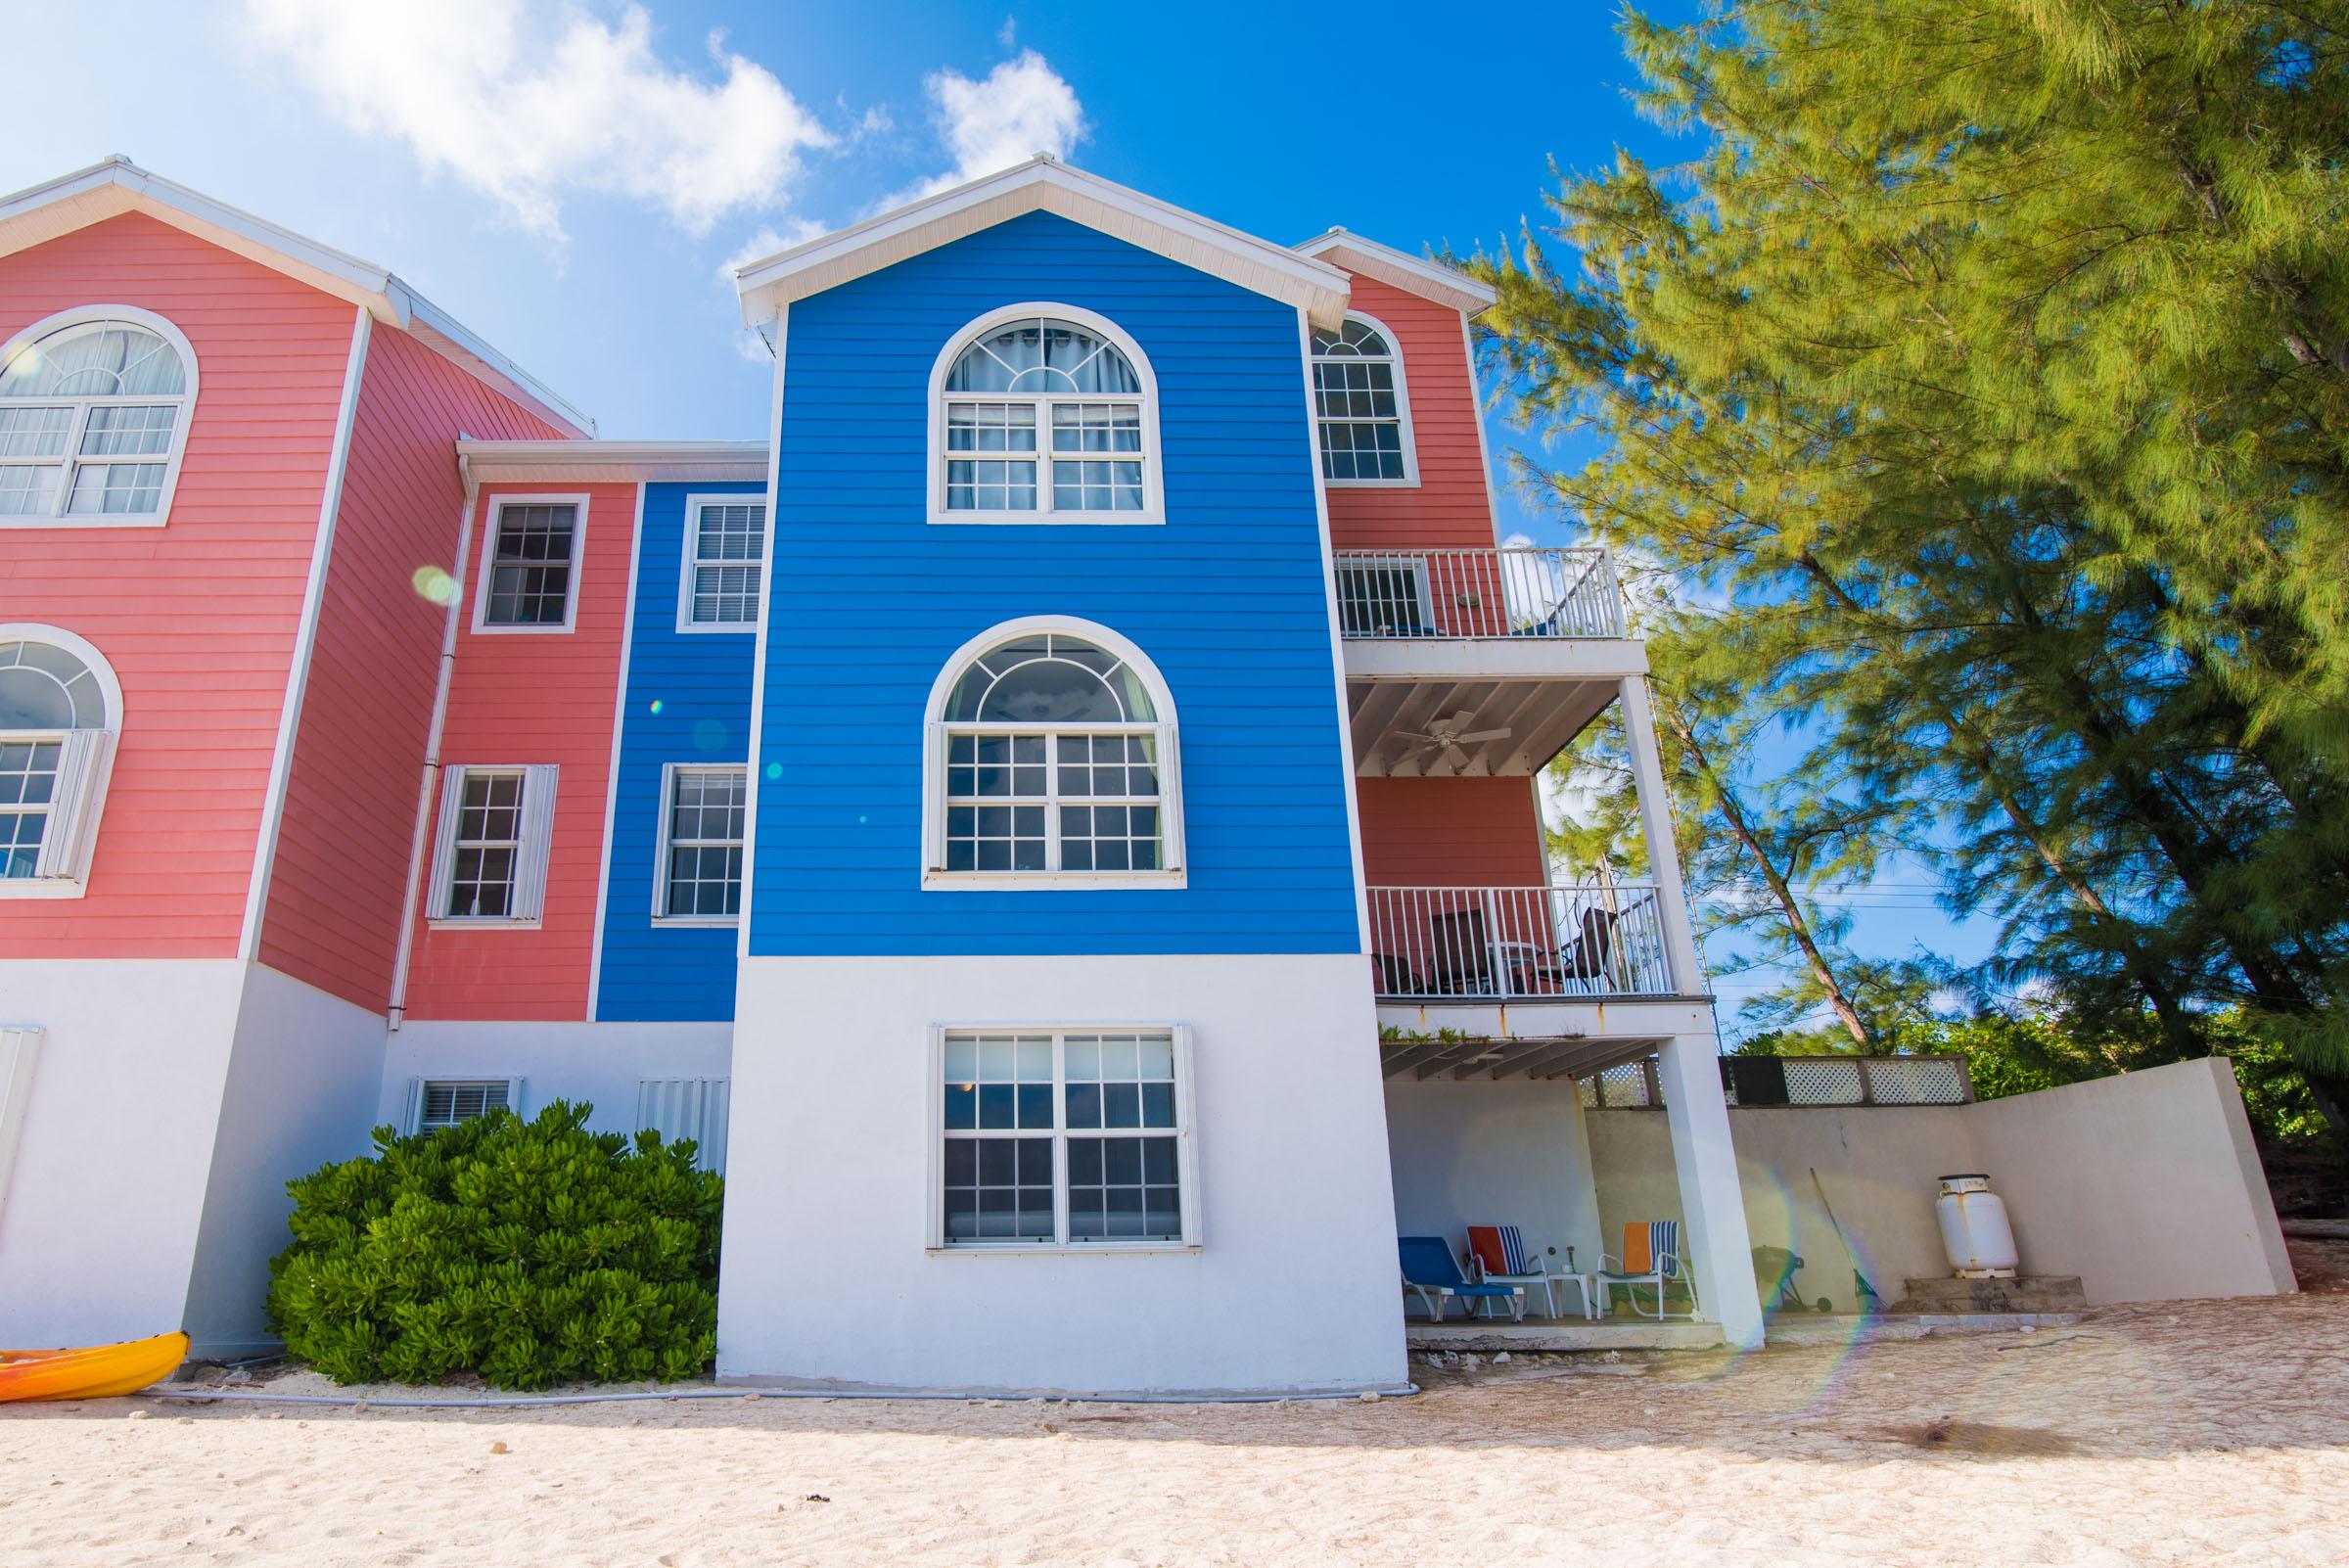 Paradise Villas #1 Rear